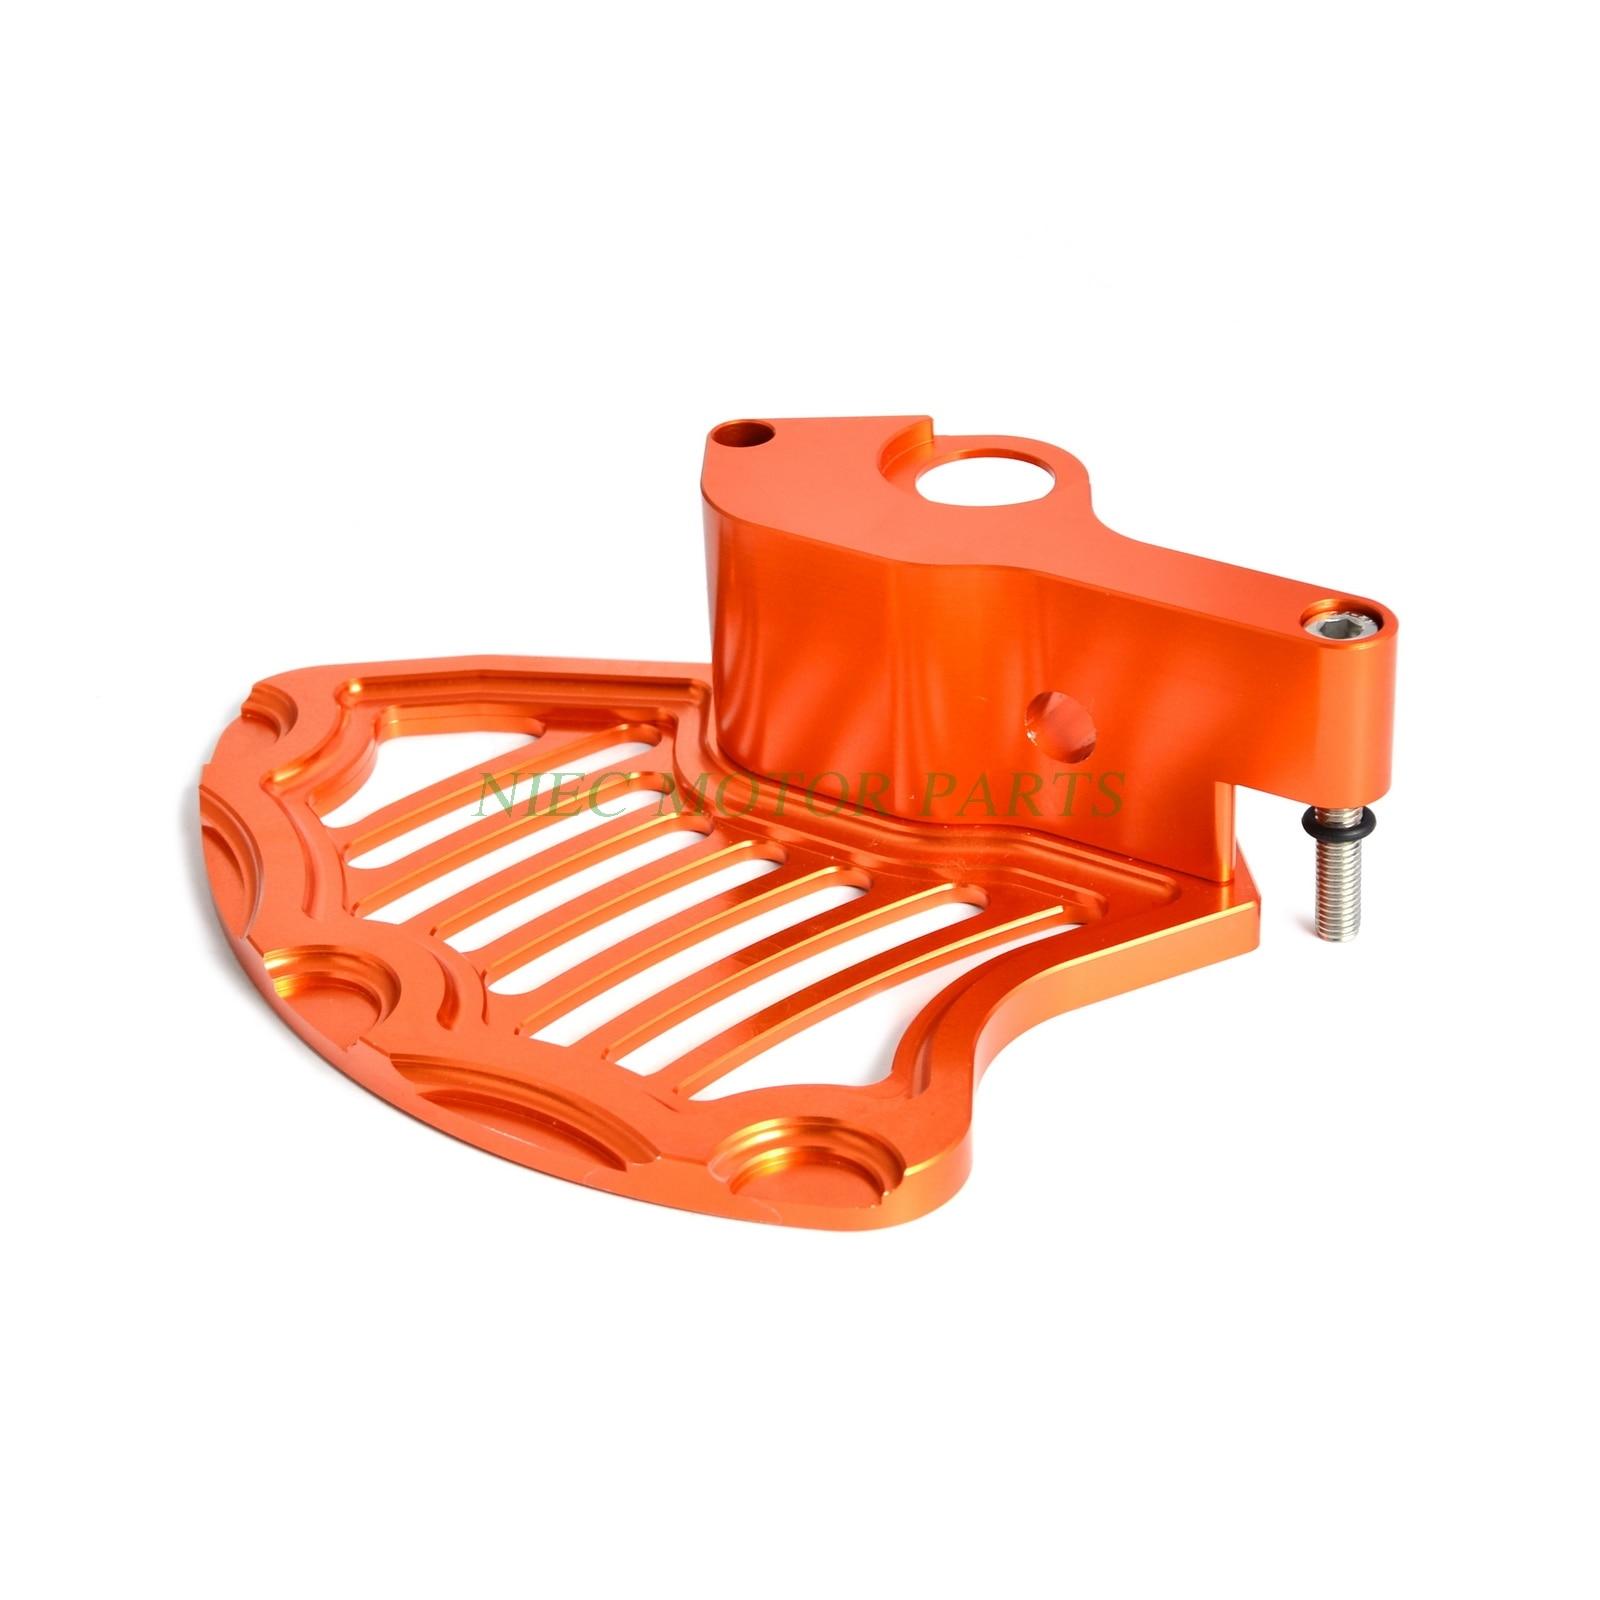 Orange CNC Front Brake Rotor Disc Guard For KTM 125-500 XC-W EXC EXC-F 2016-2020